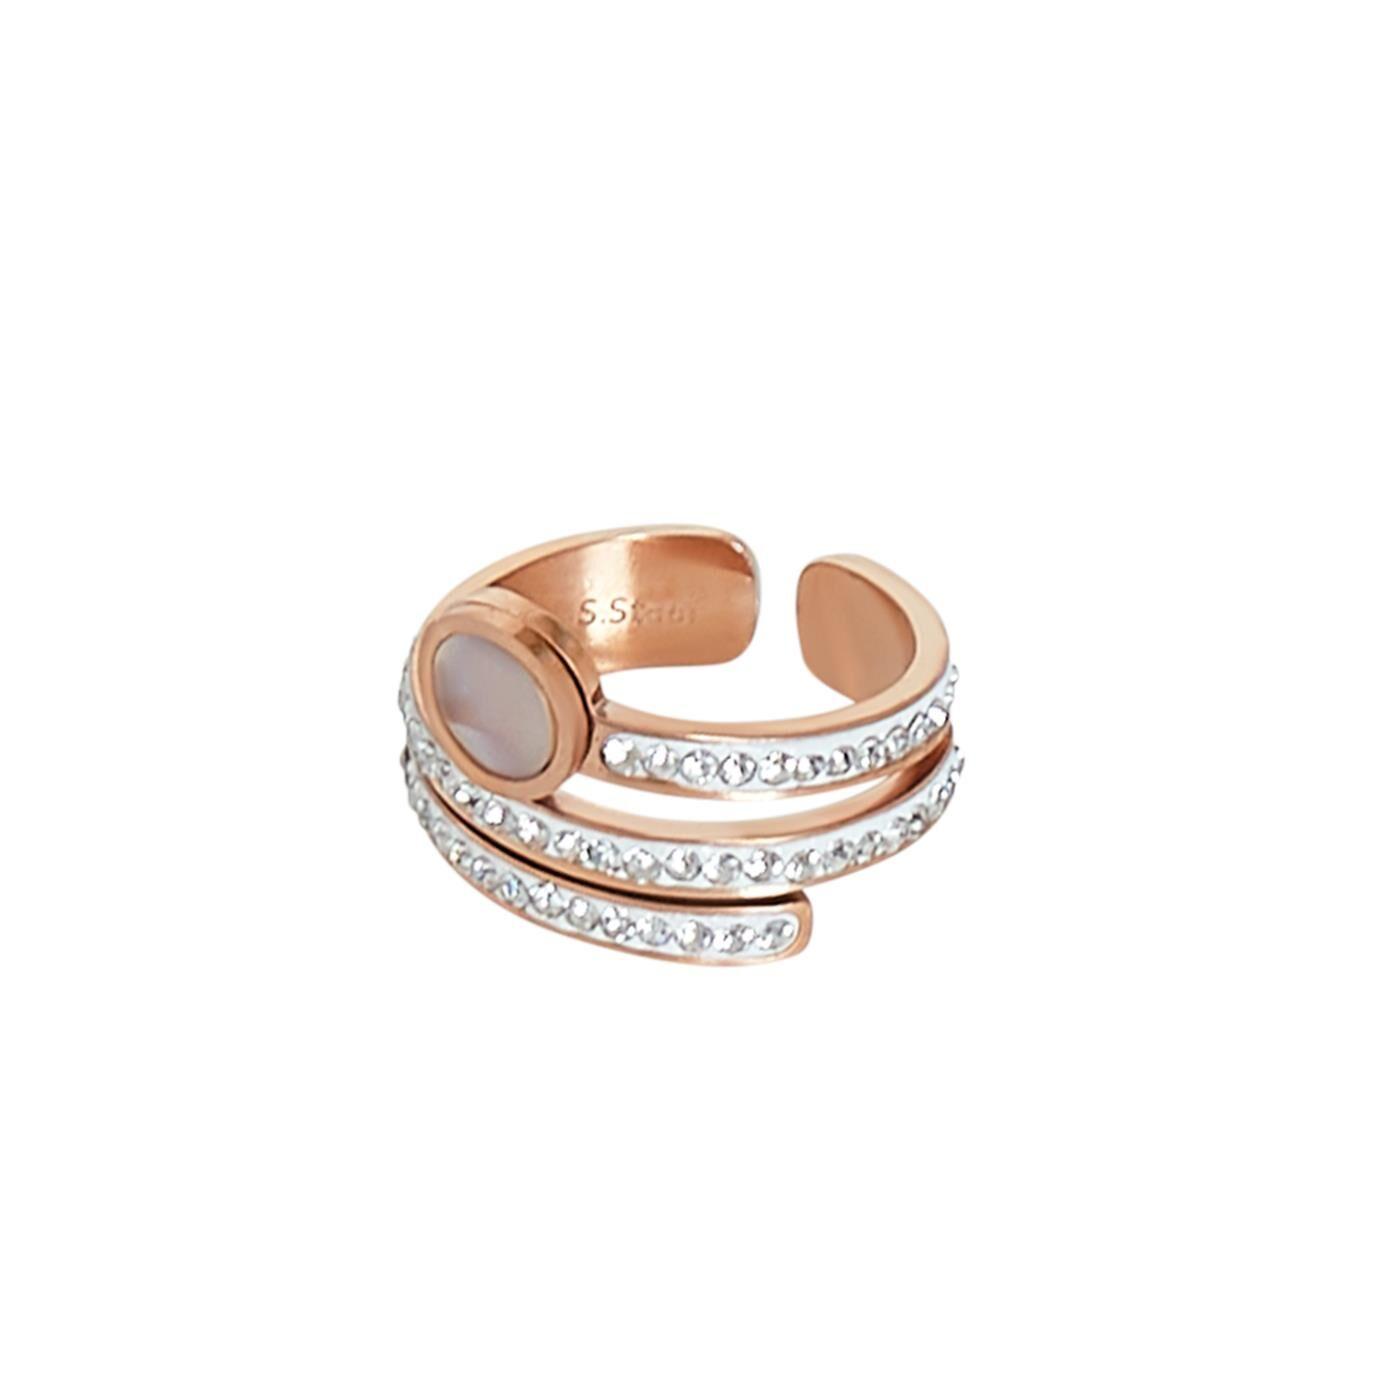 Celestino Δαχτυλίδι με strass  - Ροζ λευκο - Grootte: 18